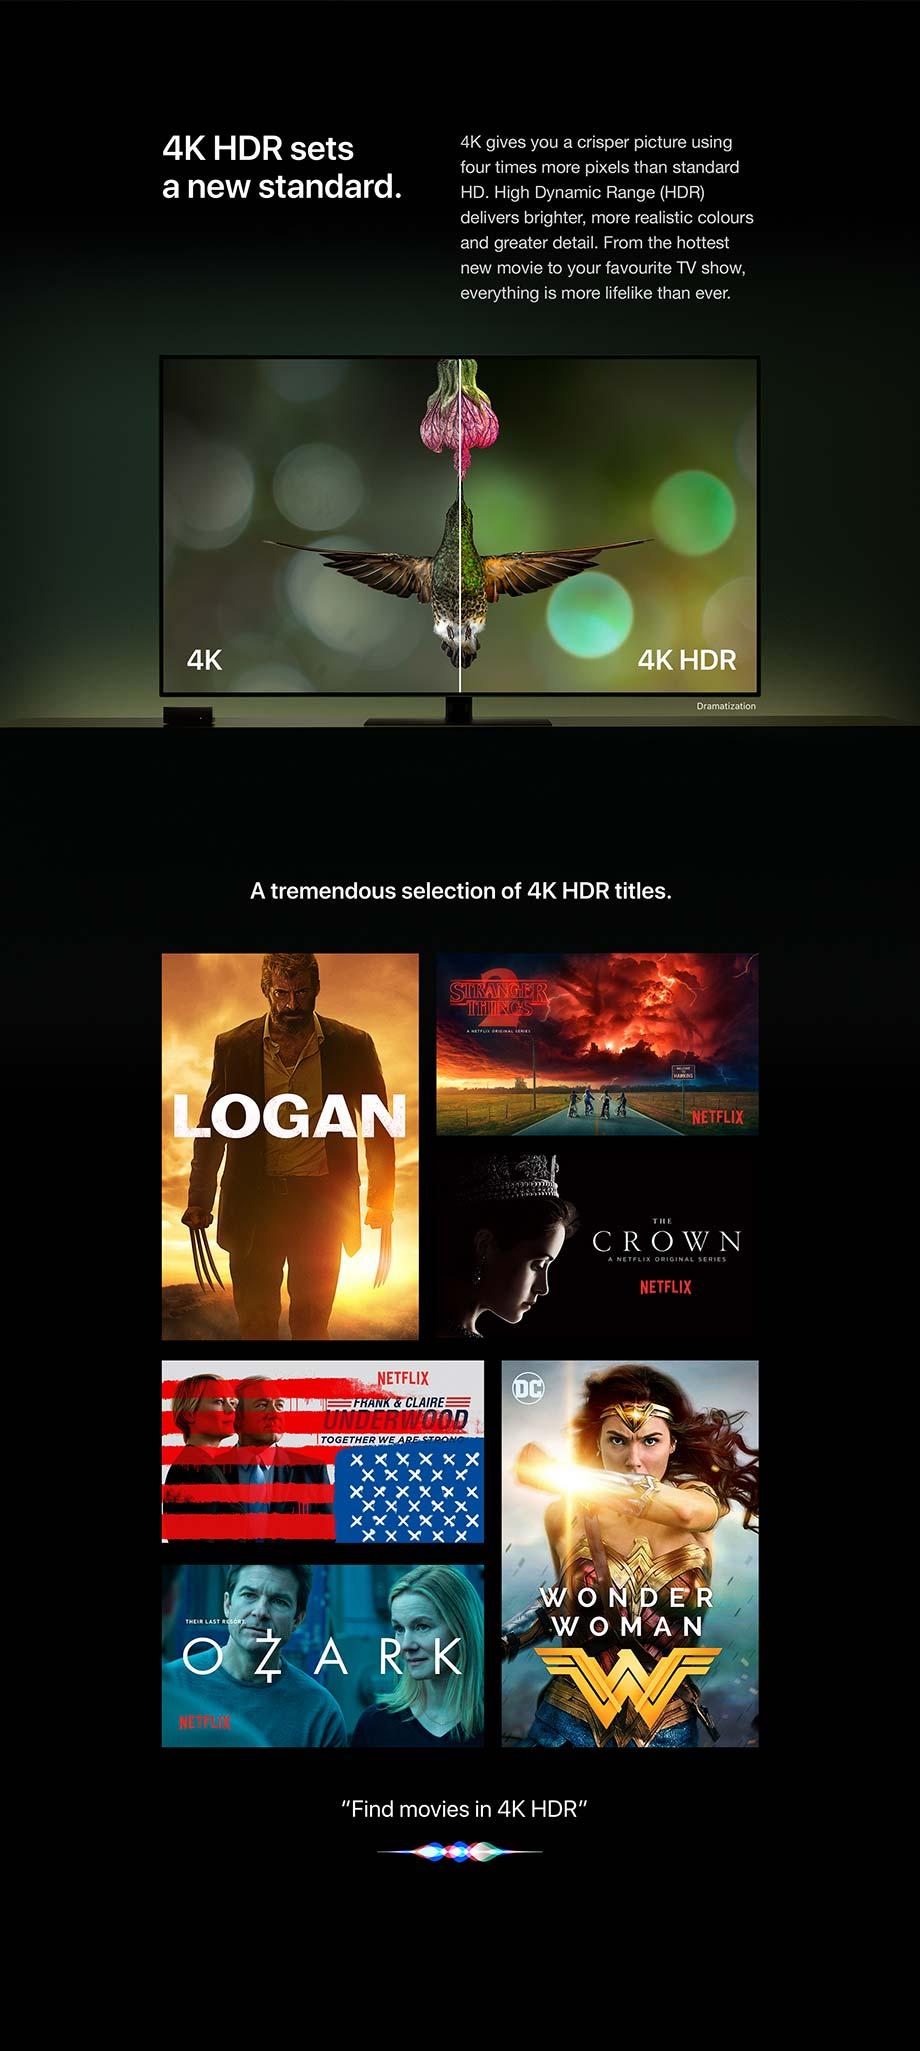 4K HDR sets a new standard.